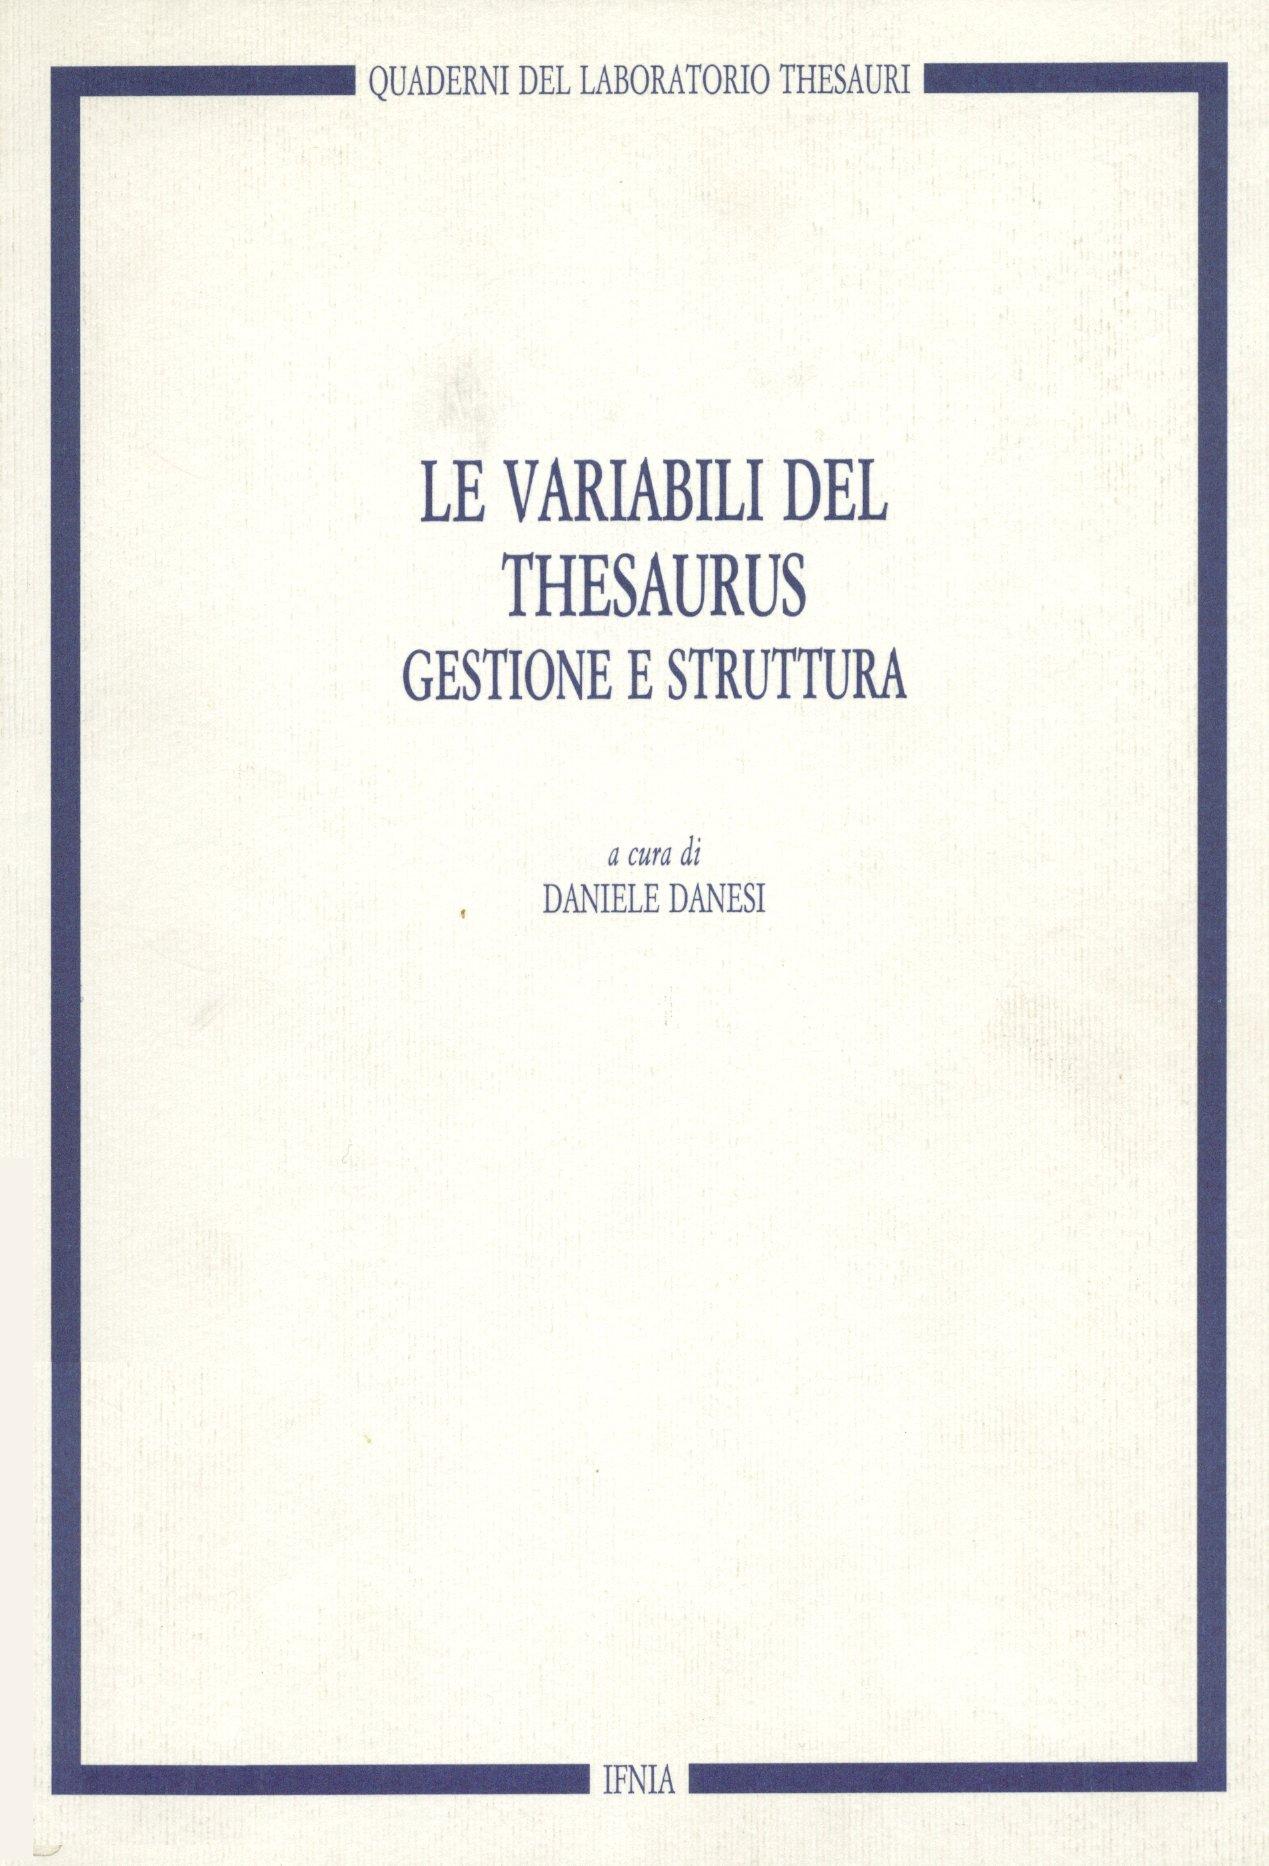 Le variabili del thesaurus